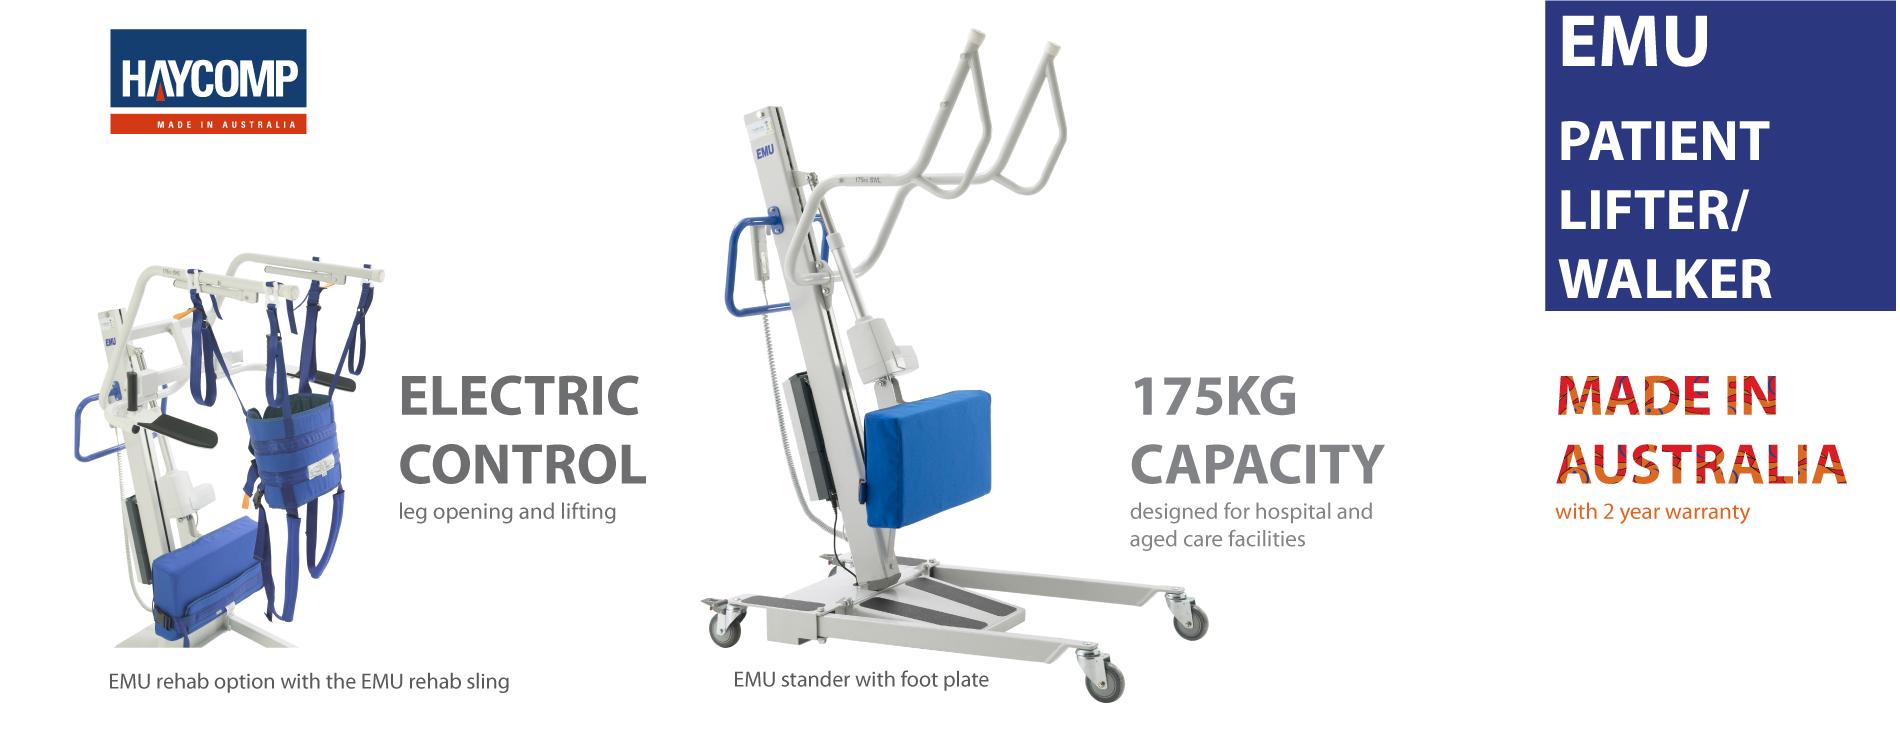 EMU 1900X750